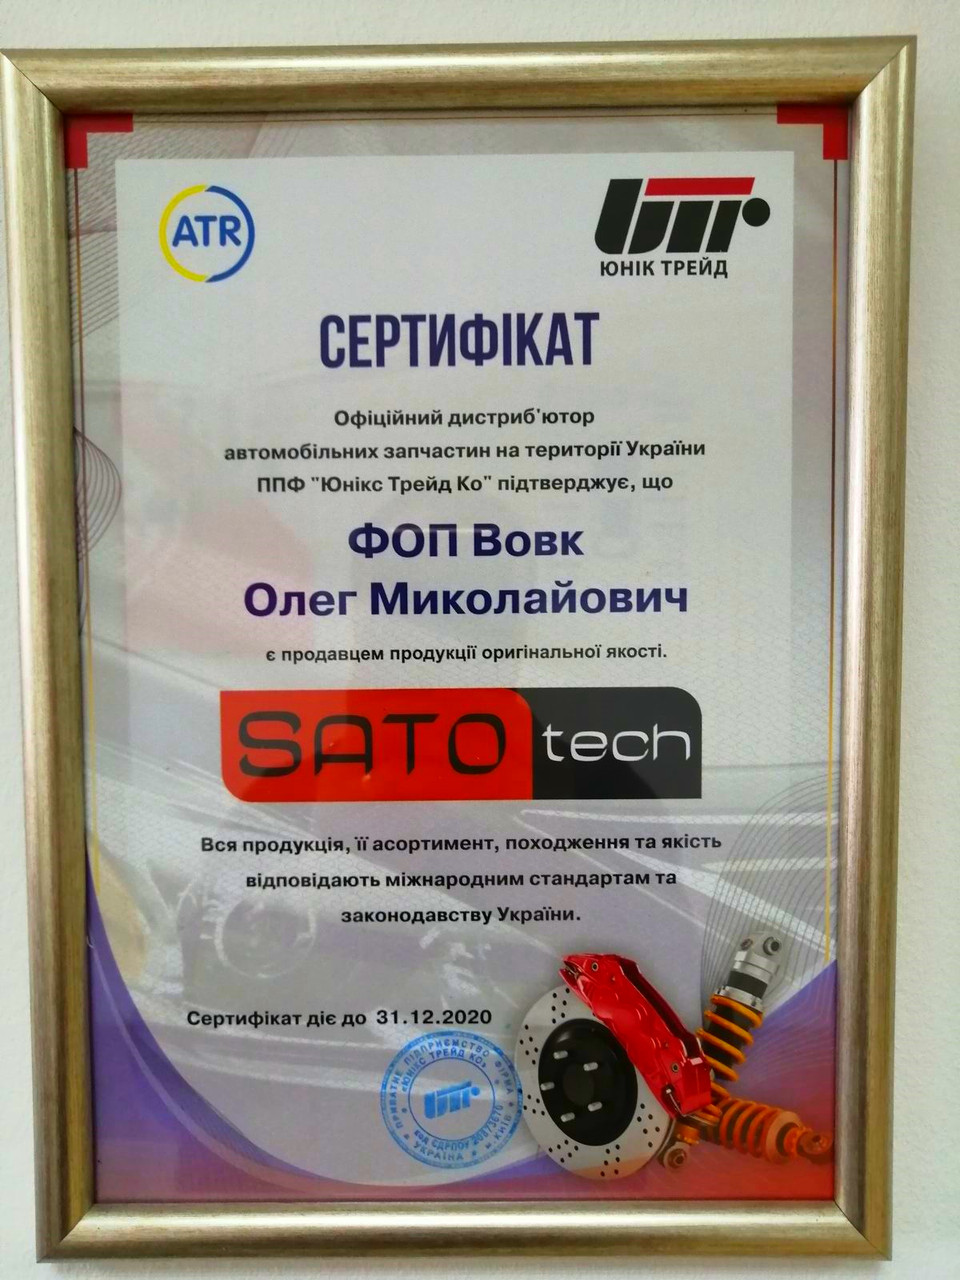 SATO Амортизатор Smart Fortwo 450 98-